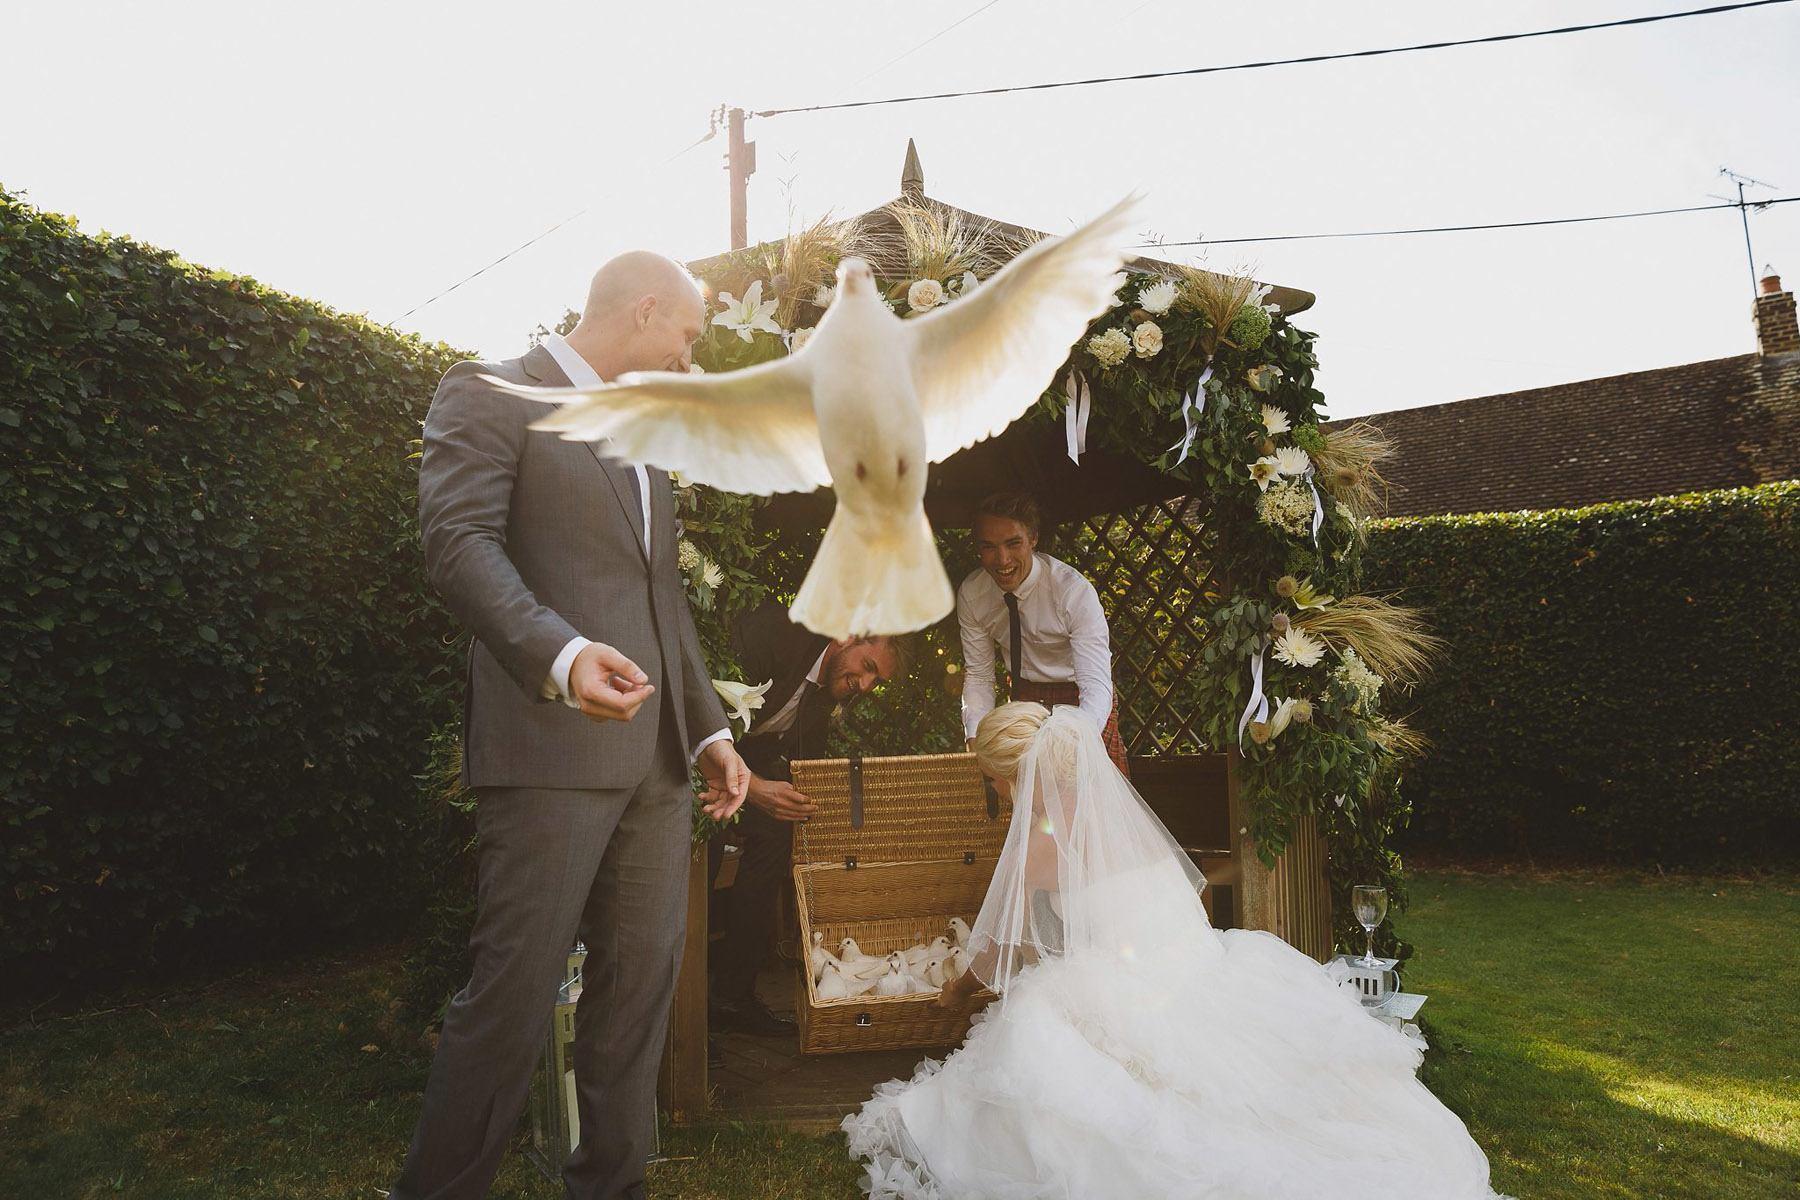 oxfordshire-wedding-photographer-045